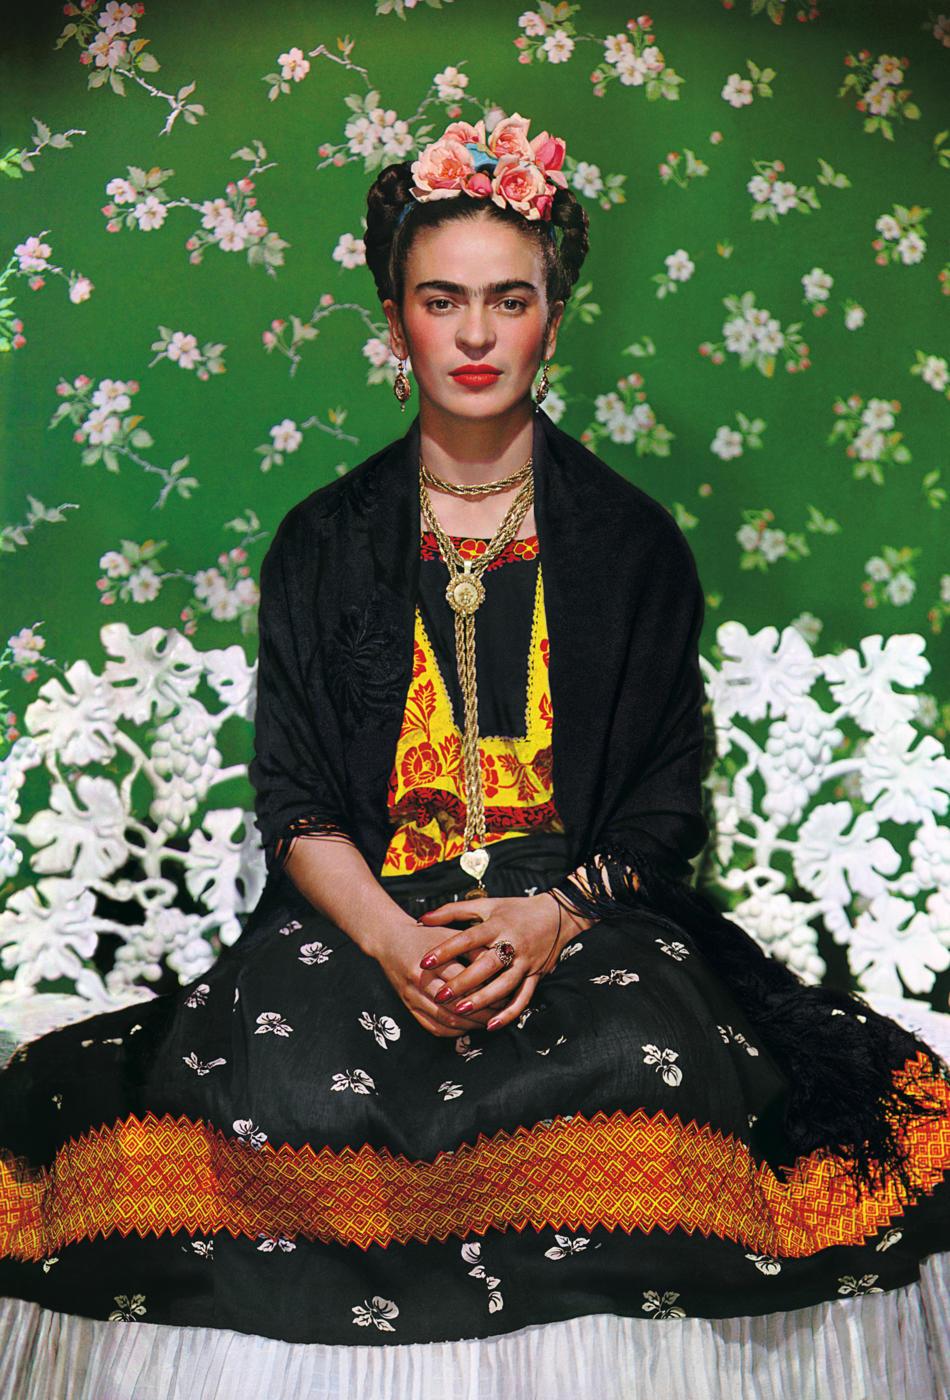 3. Frida on White Bench. Photo by Nickolas Muray; © Nickolas Muray Photo Archives (1)